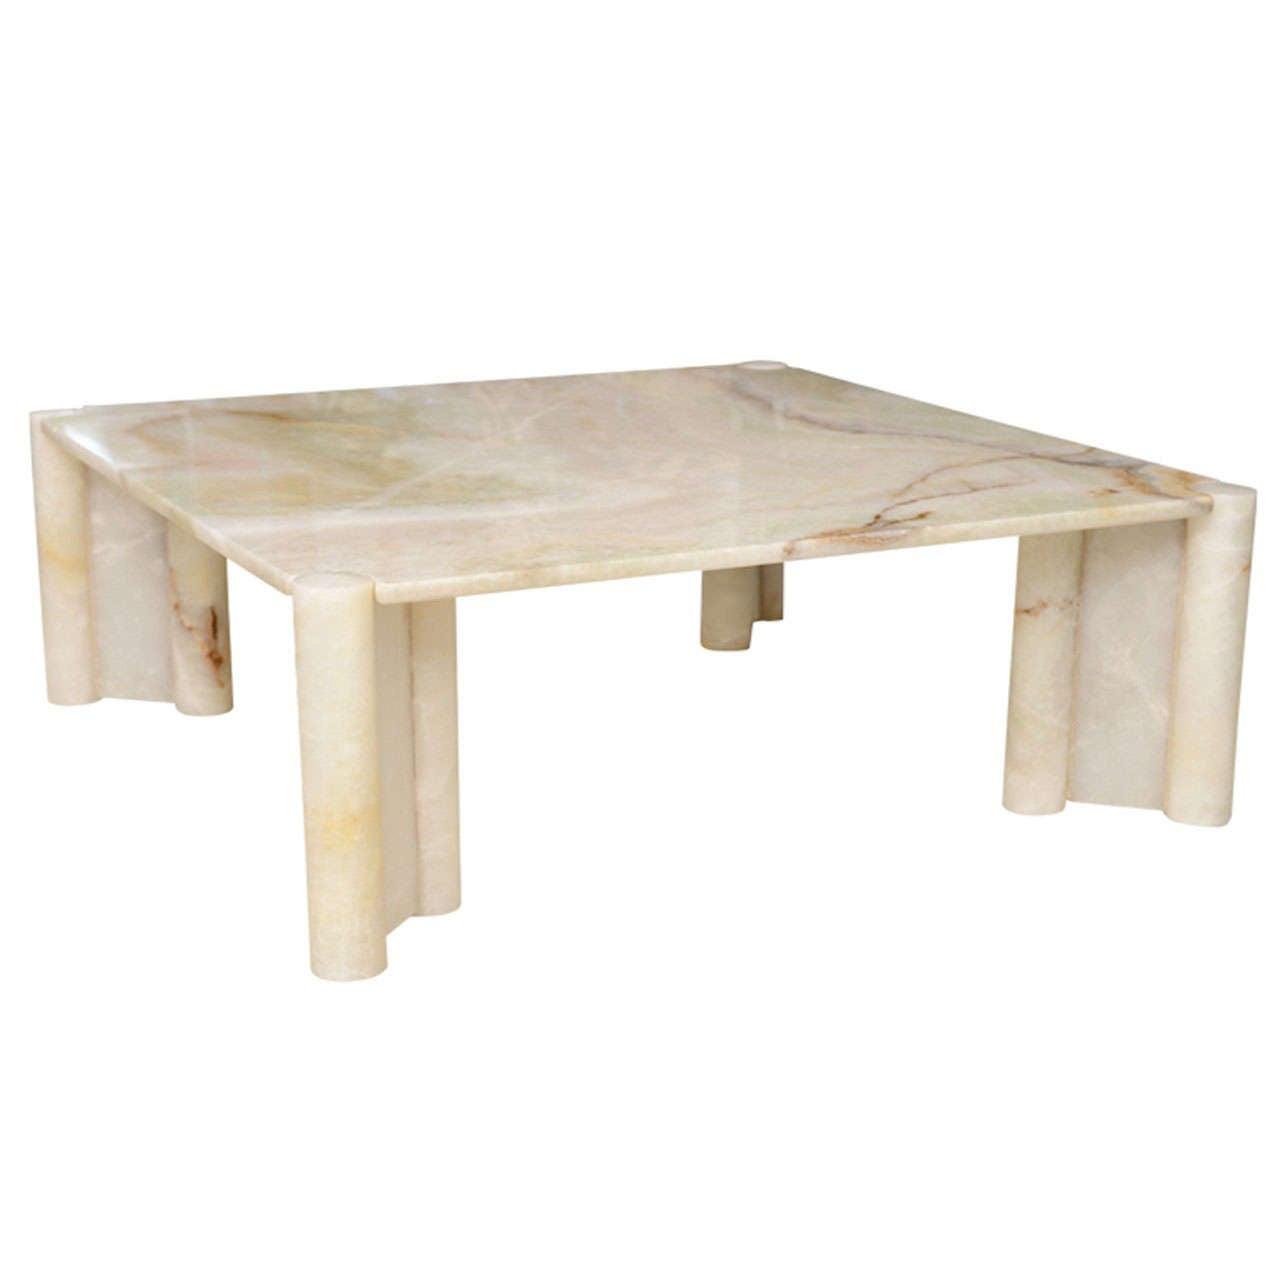 A Rare Gae Aulenti Onyx Jumbo Low Table Italy 1970s At 1stdibs